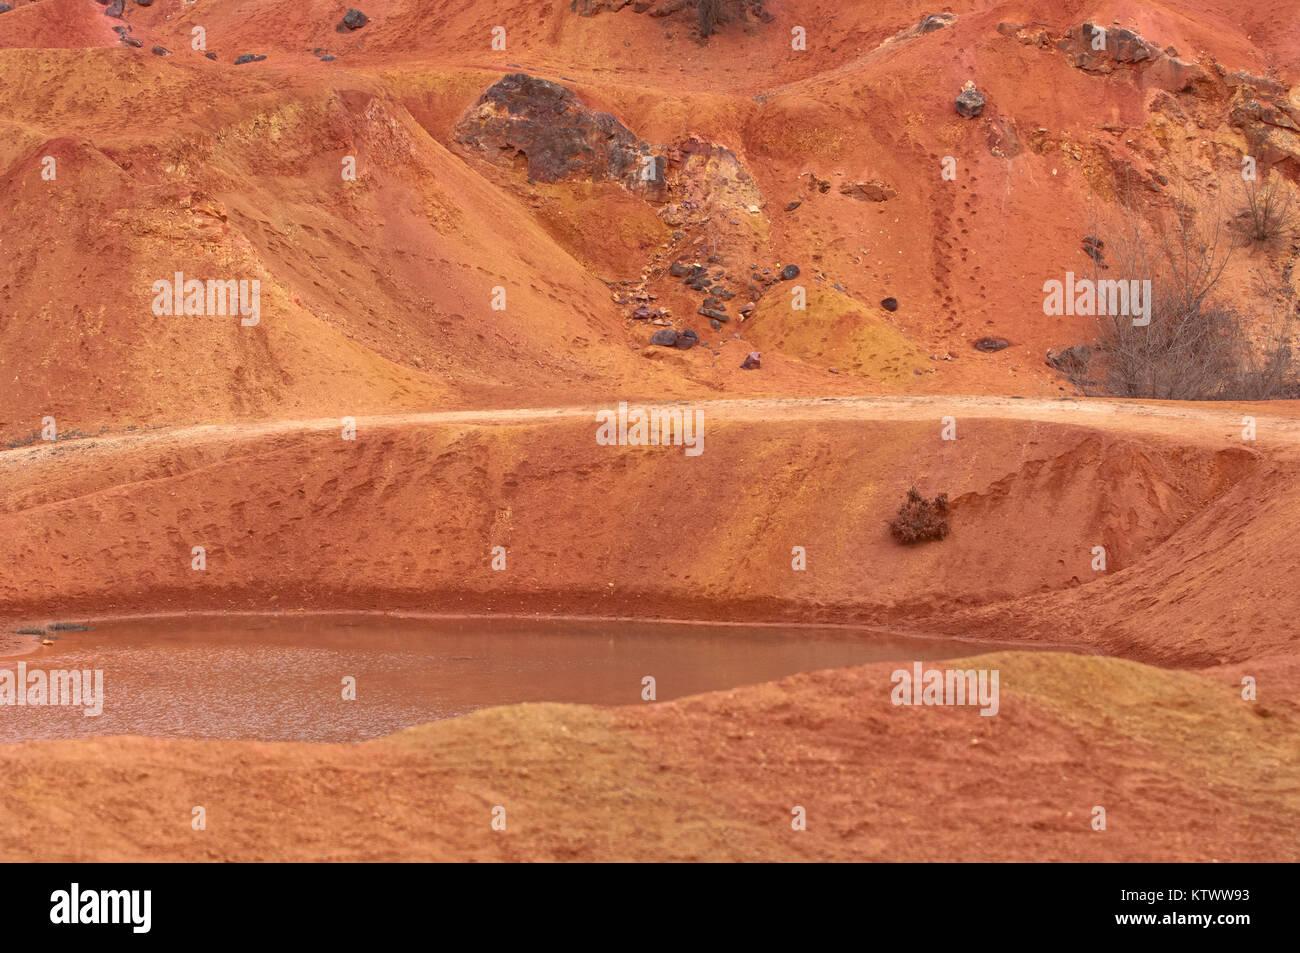 Bauxite mine, raw weathered bauxite sedimentary rock on surface - Stock Image